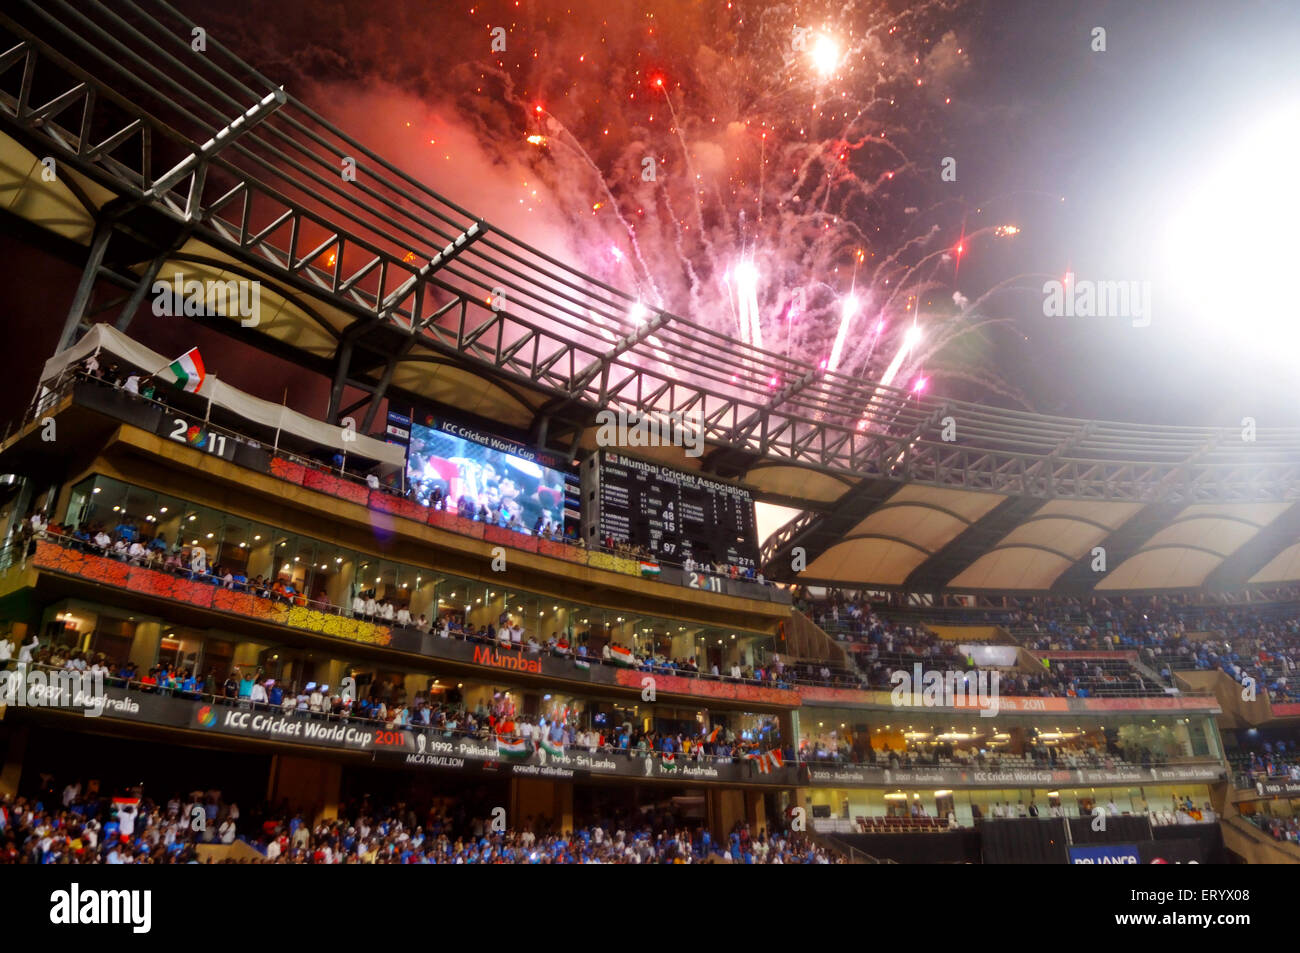 Fire crackers busted defeated Sri Lanka ICC Cricket World Cup 2011 final match Wankhede Stadium Mumbai India - Stock Image